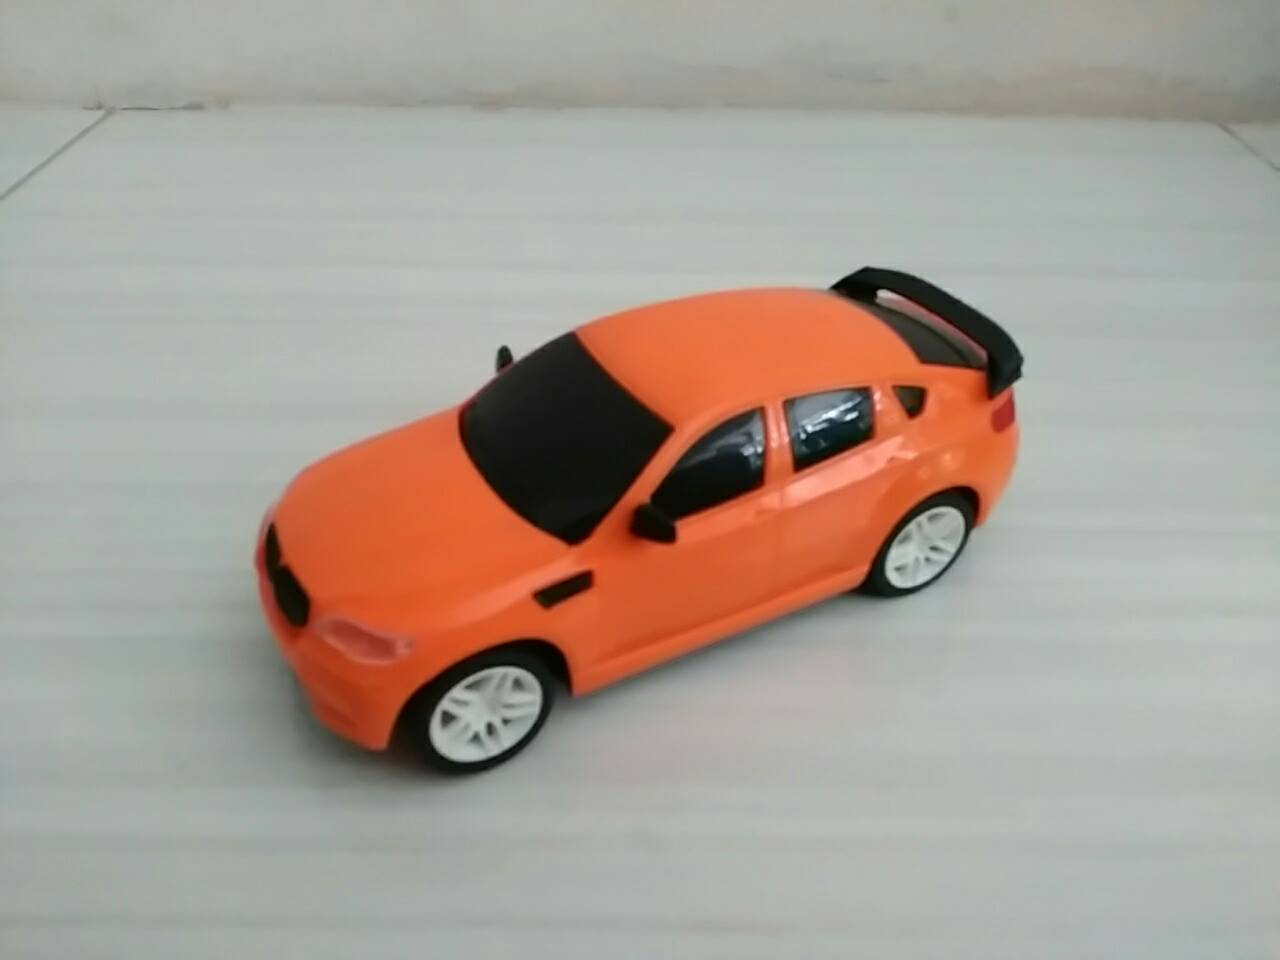 harga RC REMOTE CONTROL MOBIL MODEL SEDAN BMW SKALA 1:24 (ORANGE) Tokopedia.com